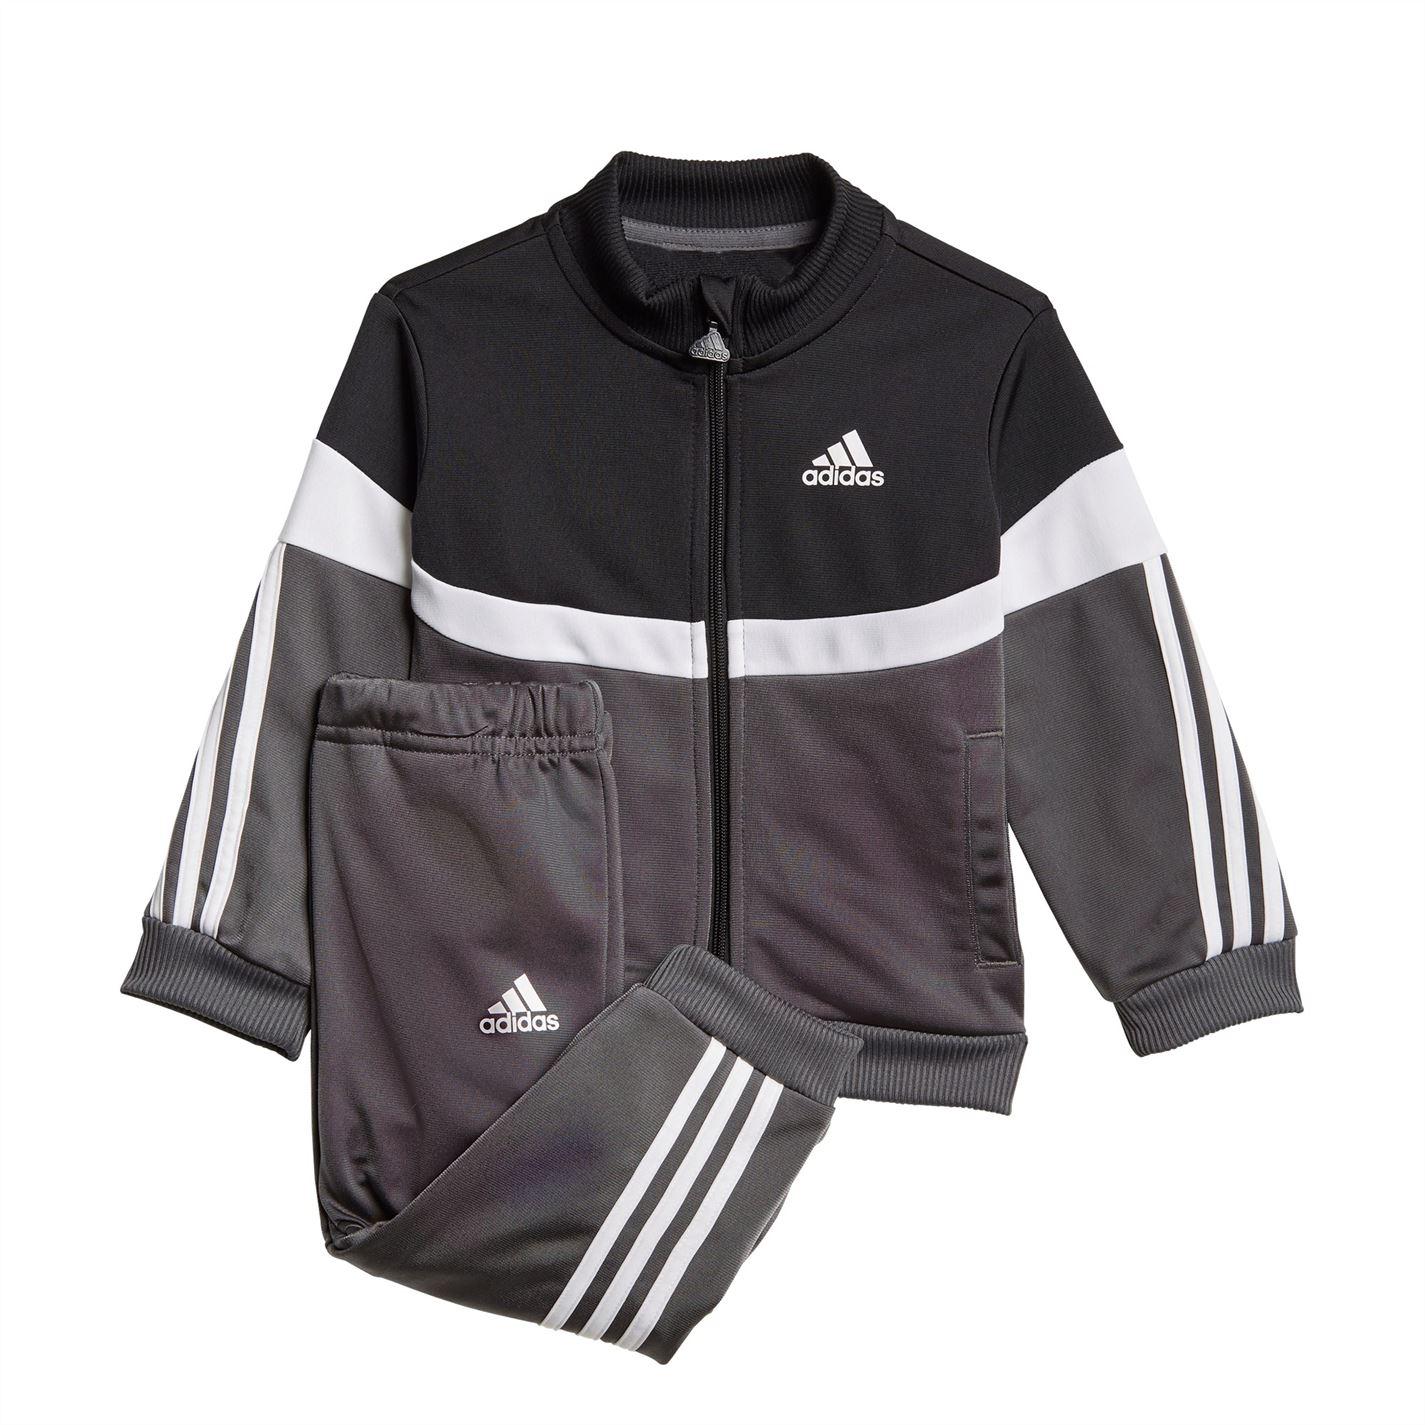 Mergi la adidas Adidas C/Blk P/Suit Bb13 gri negru